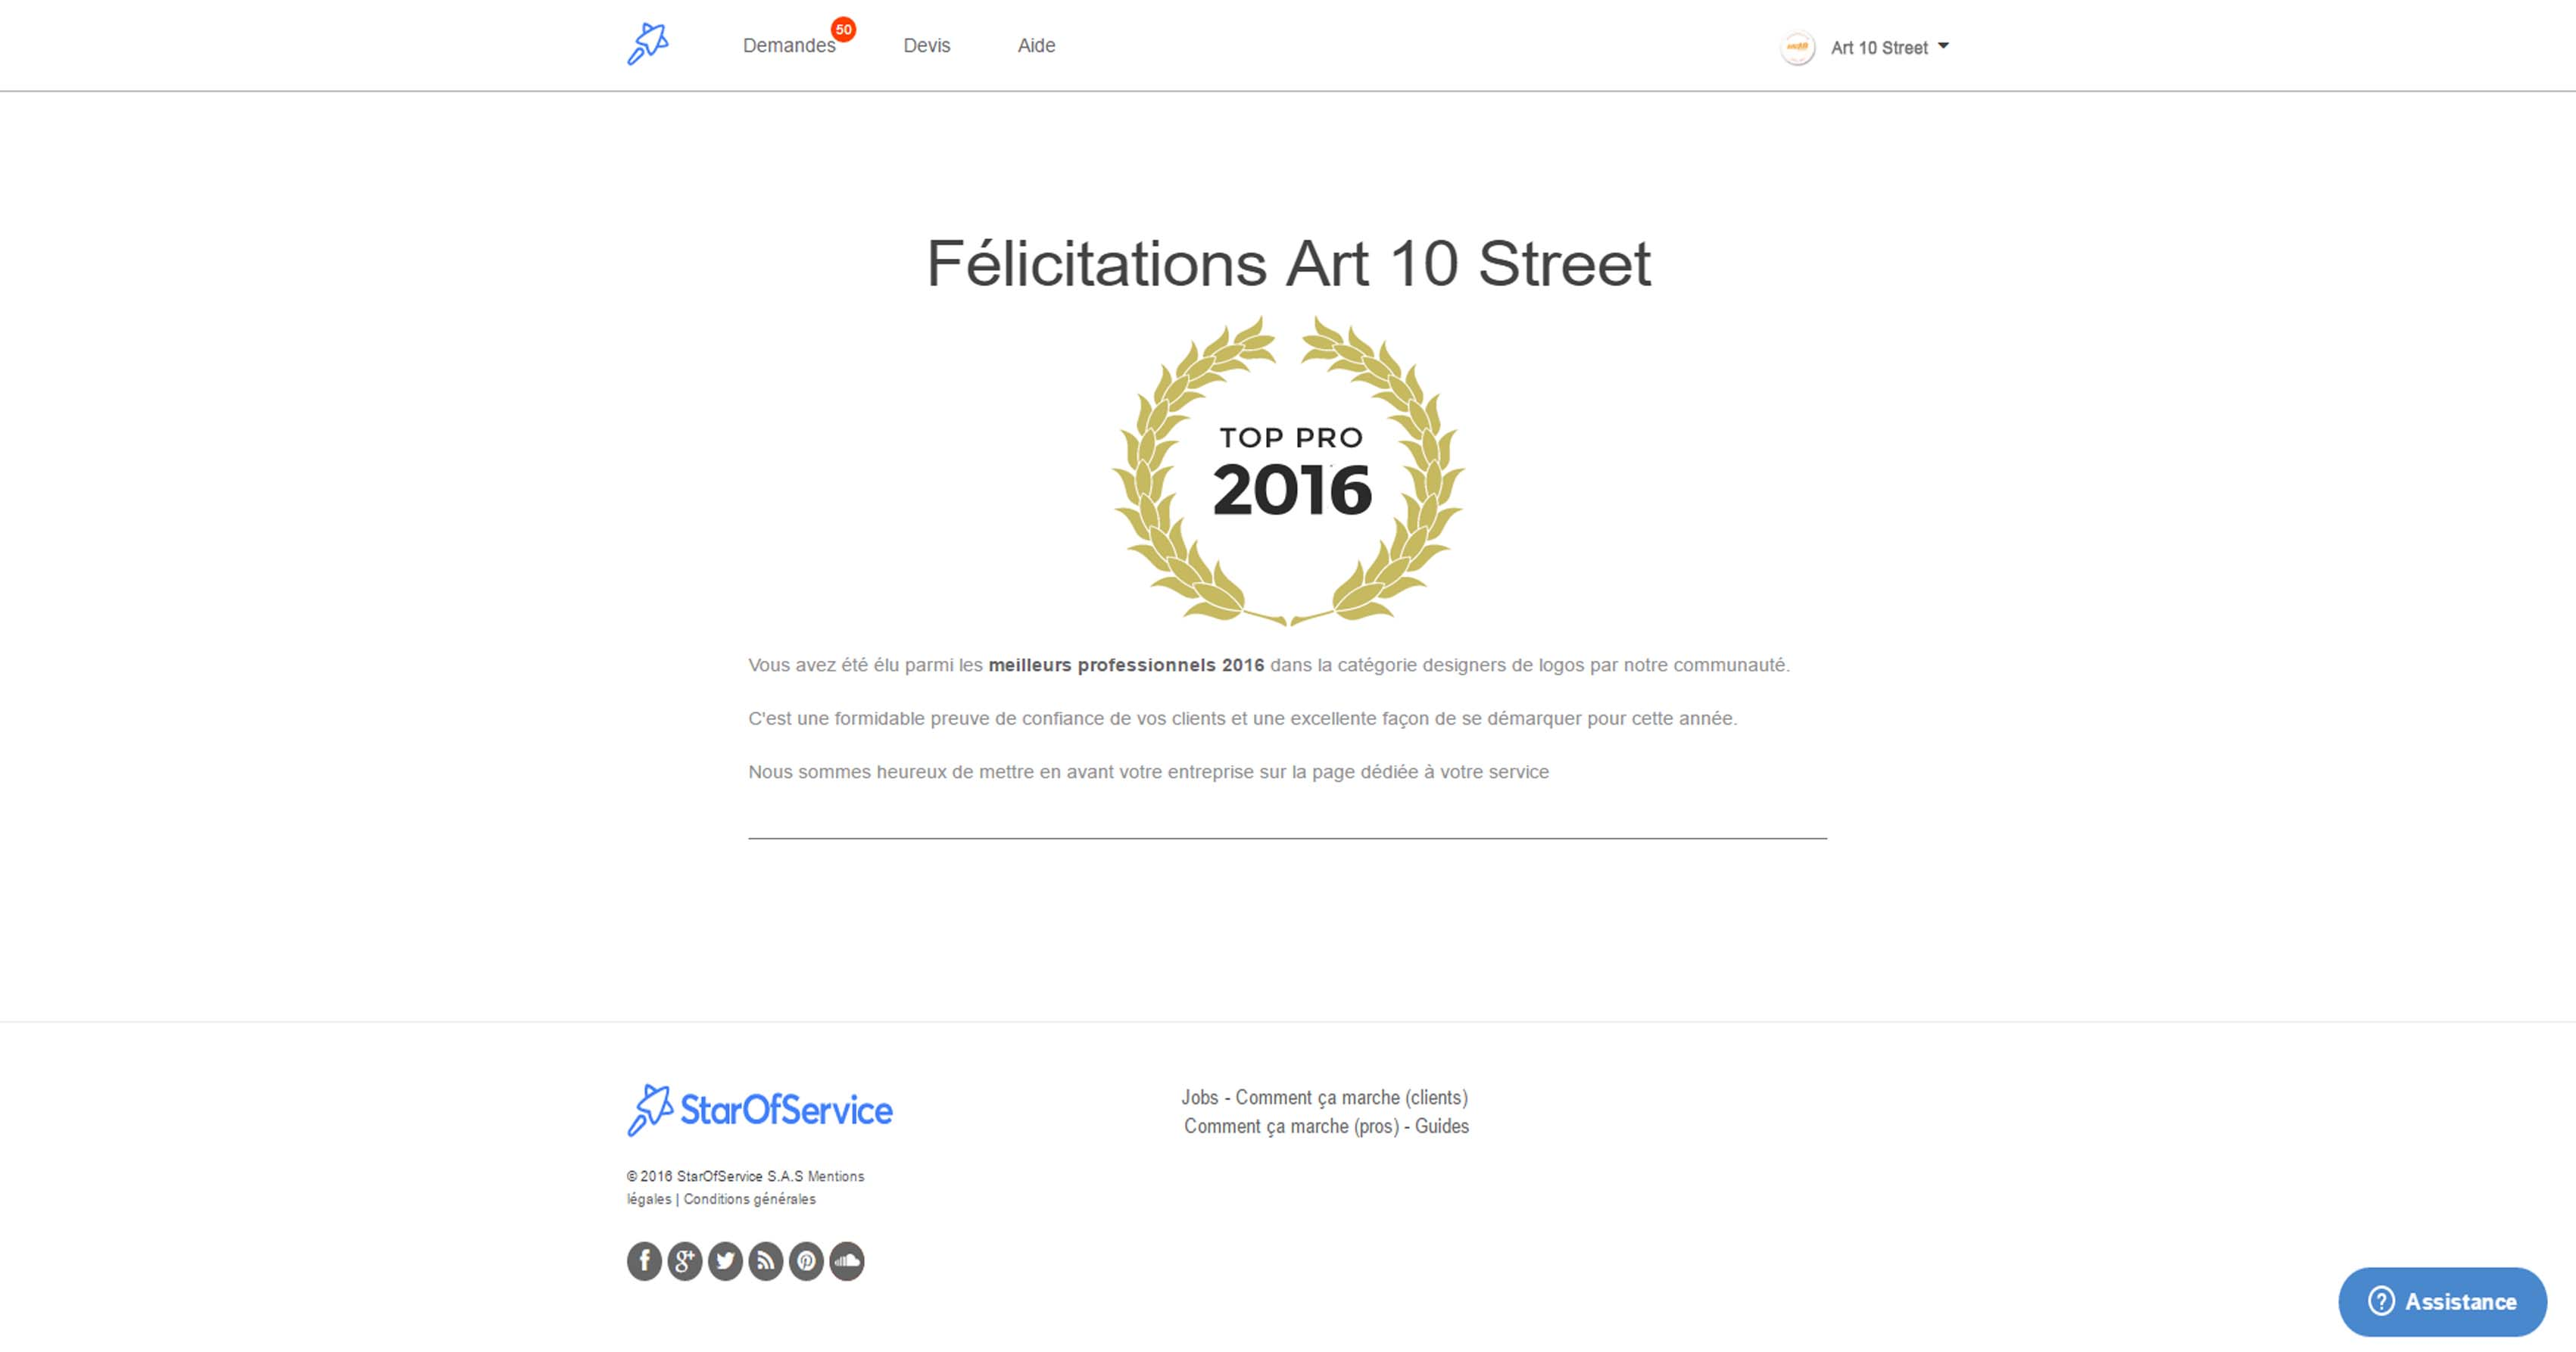 art10street_top_pro_2016